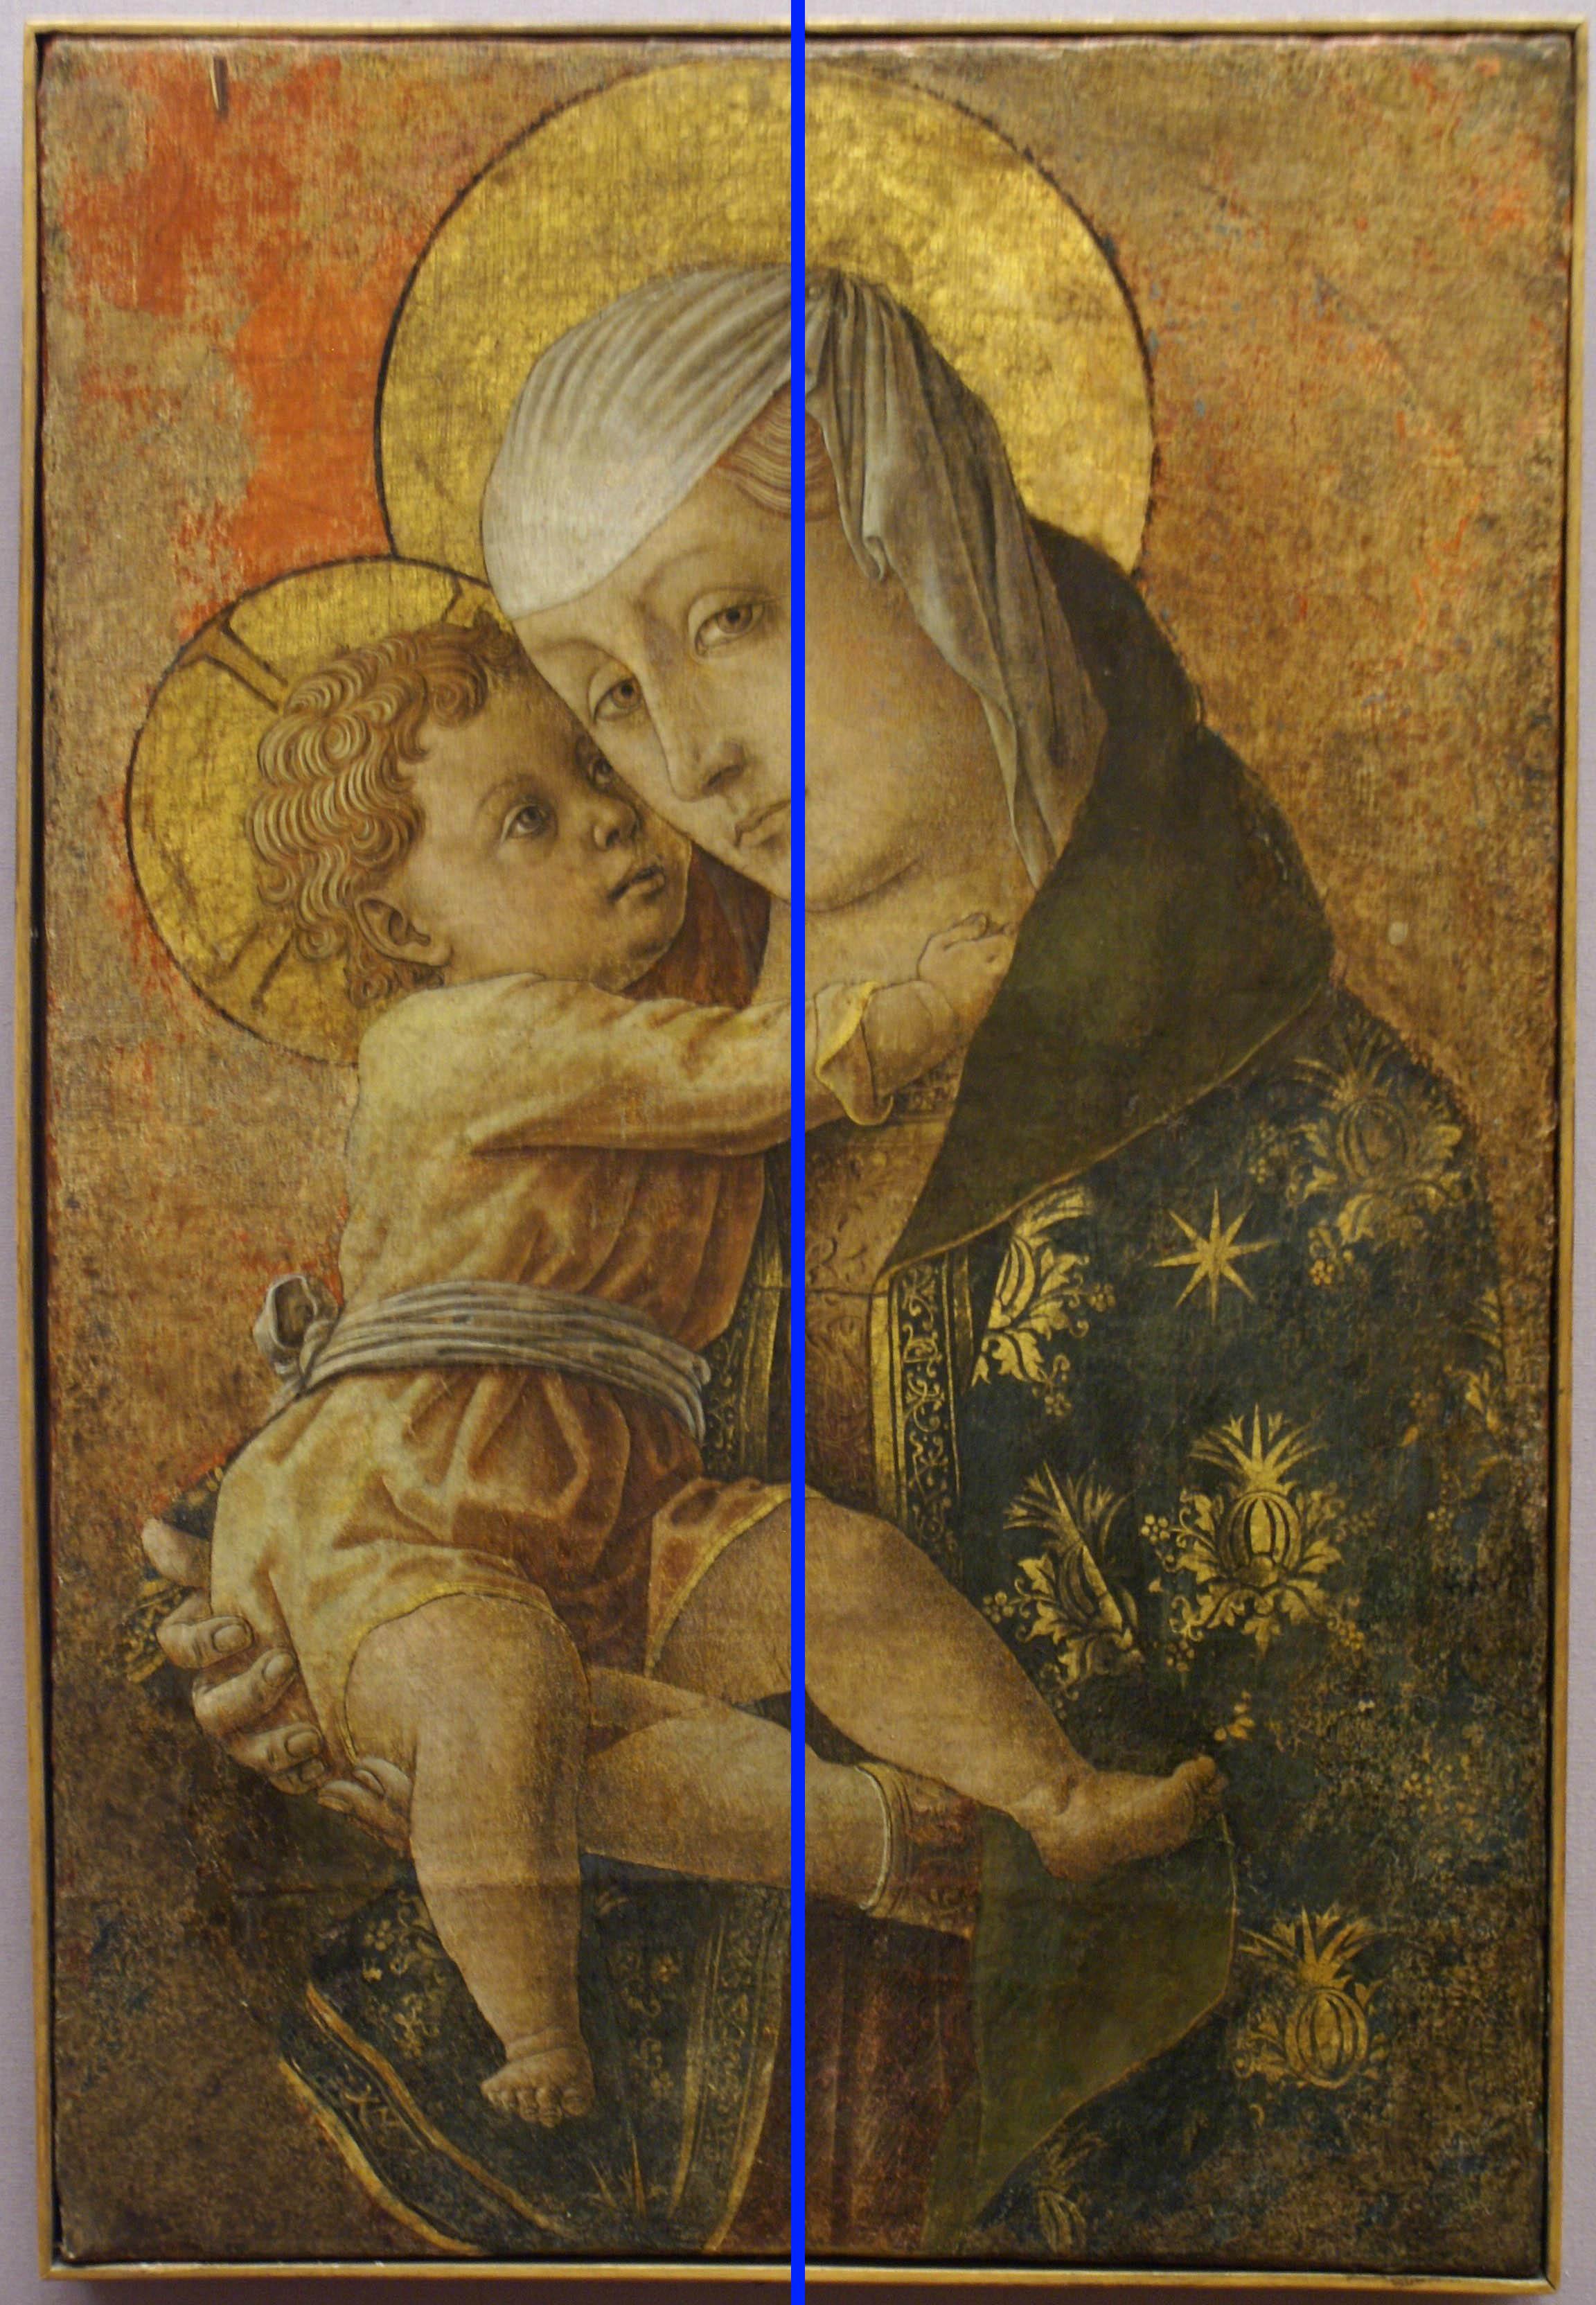 centere eye- red- Carlo_Crivelli_-_Madonna_con_Bambino copy.jpg